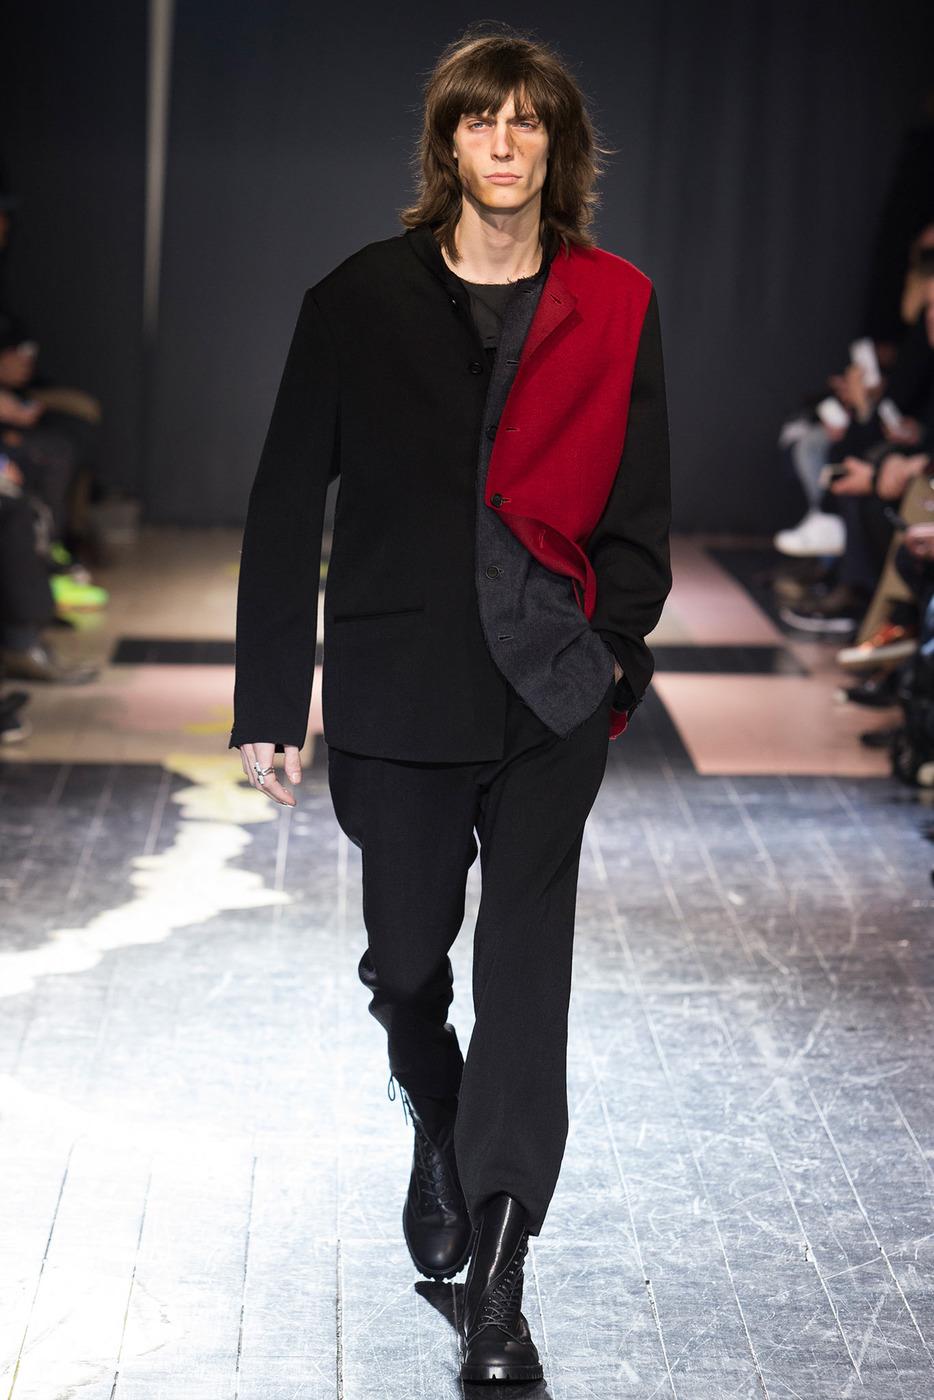 Йоджи Ямамото Отшельник мира моды  Look At Me